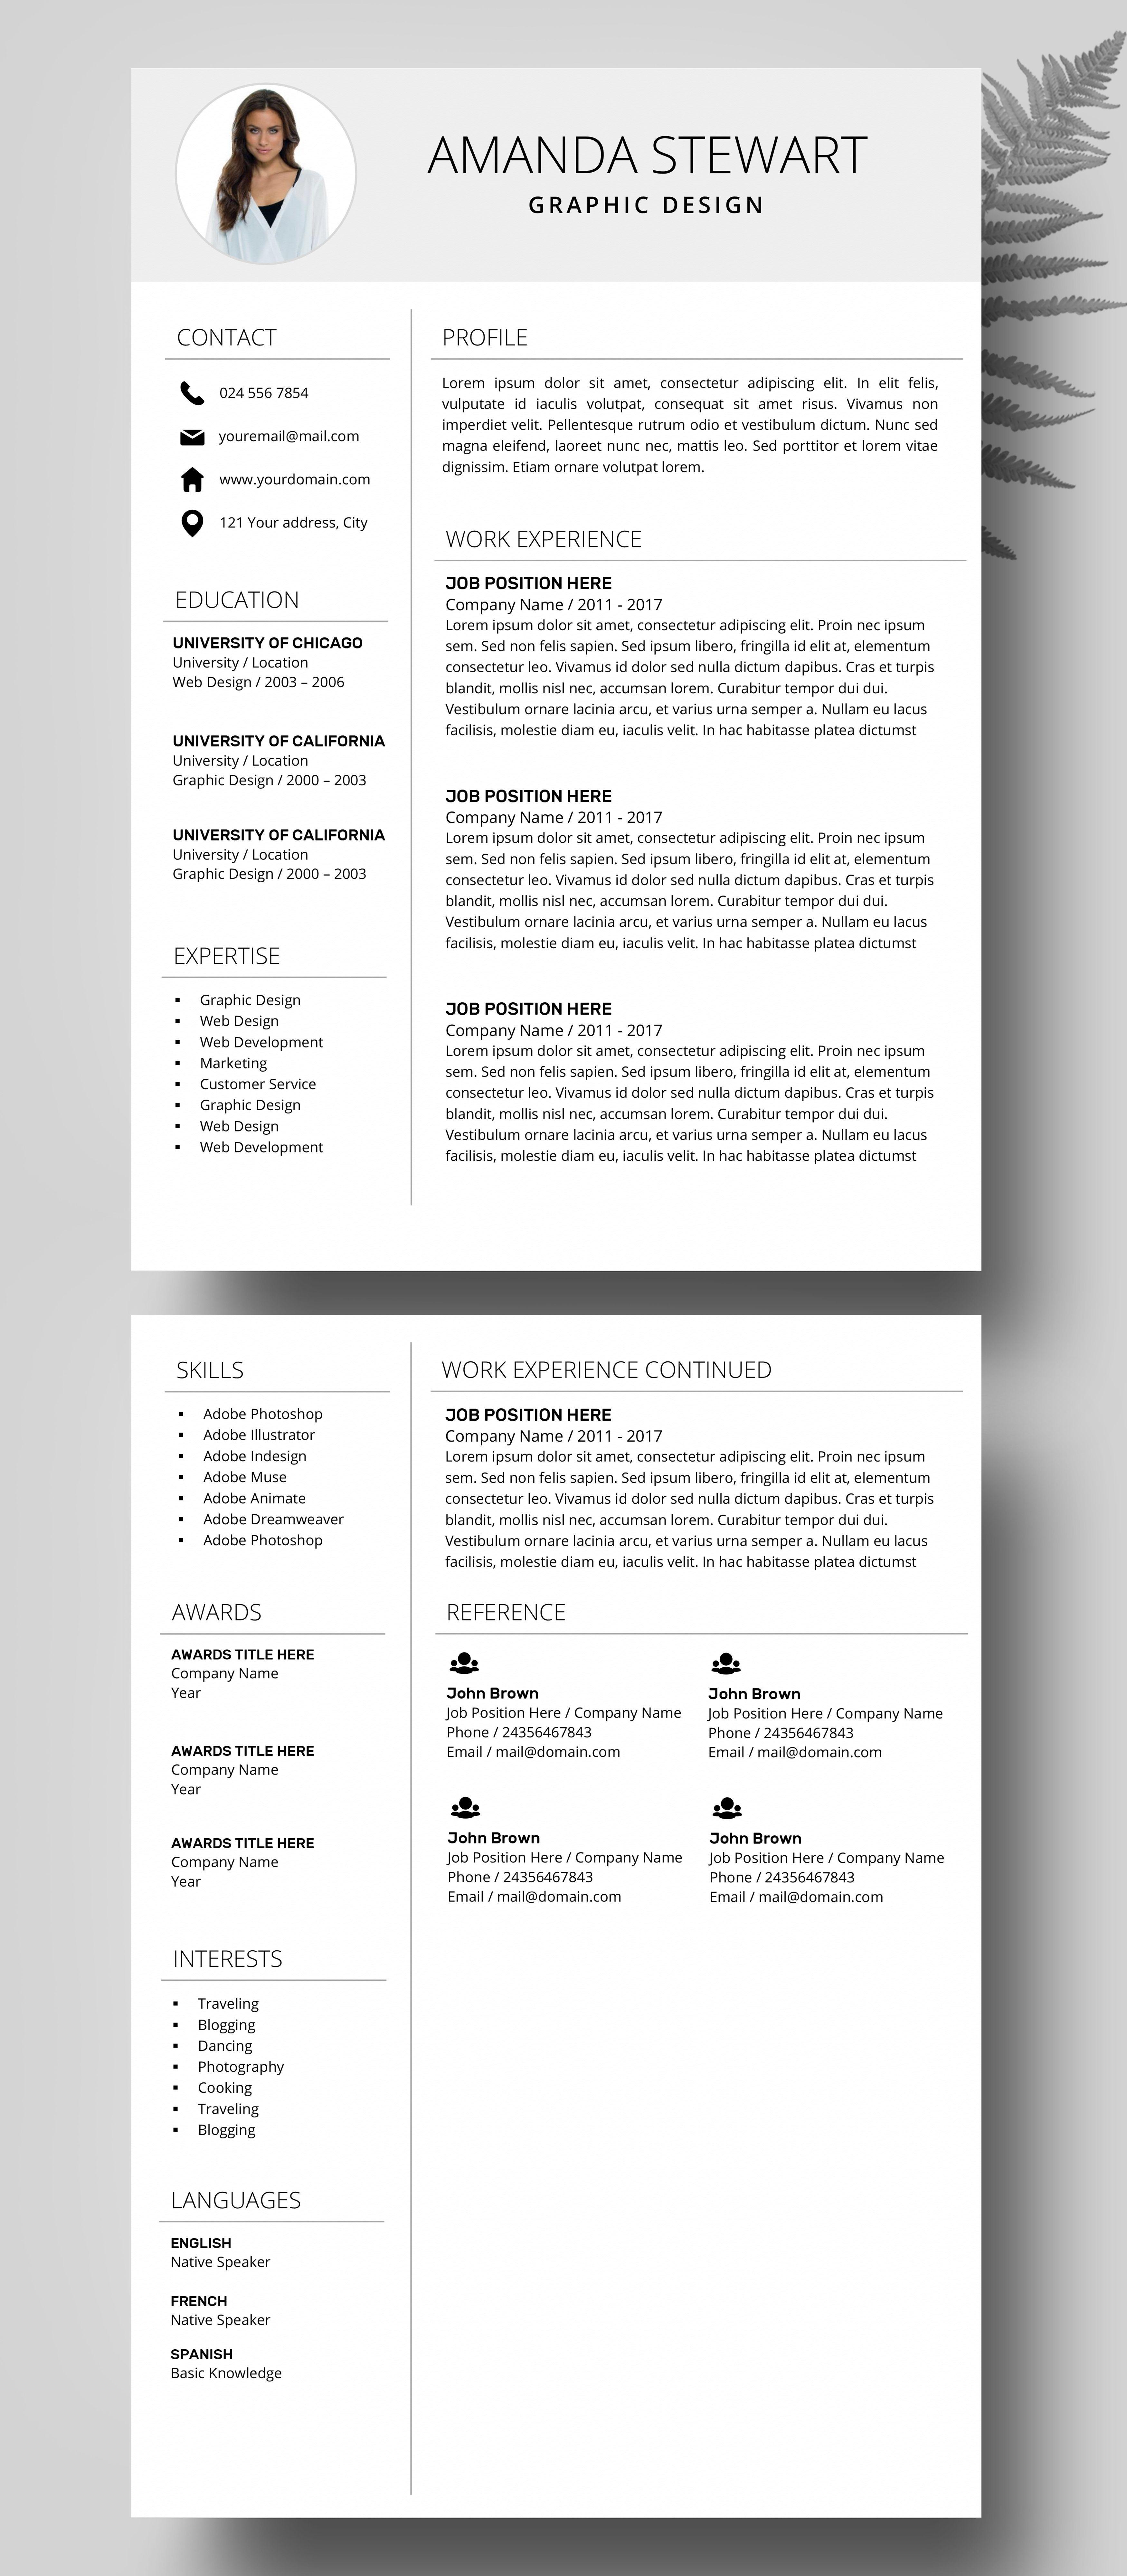 Resume Template | CV Template | Professional Resume | Resume